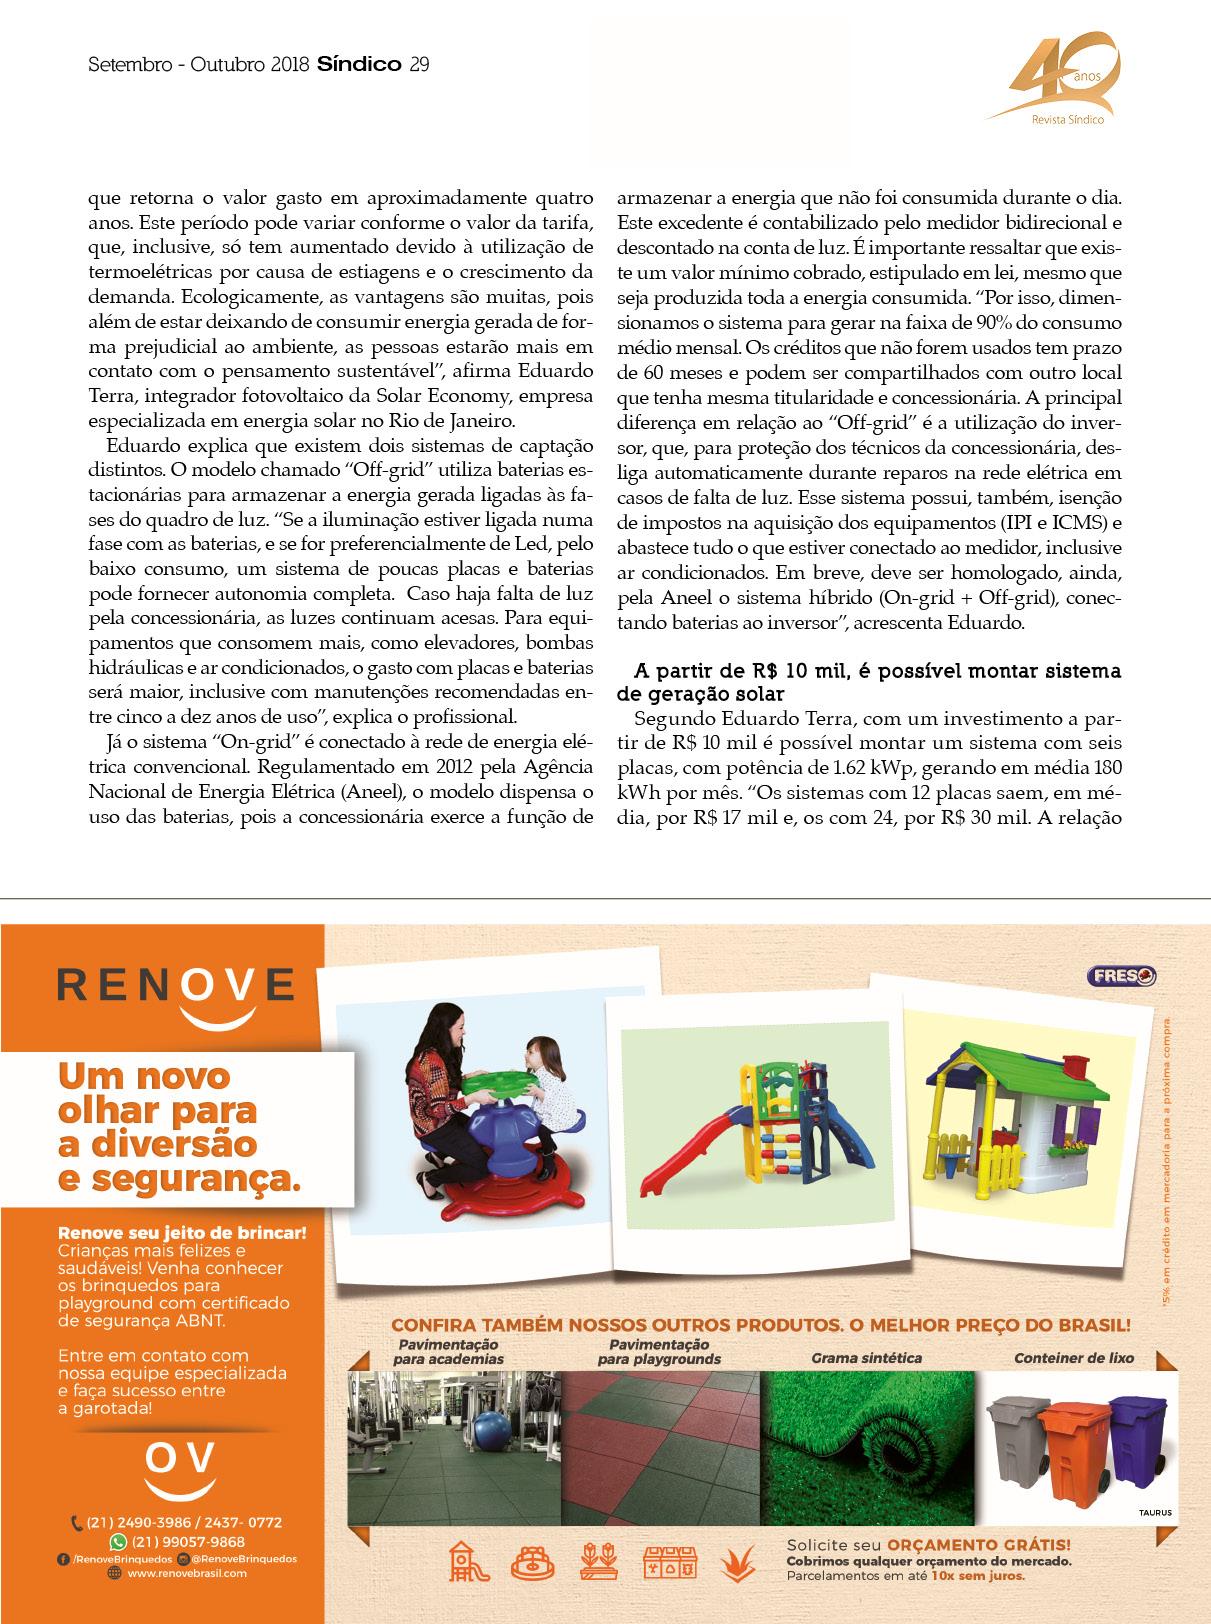 Revista Síndico_ed 24027